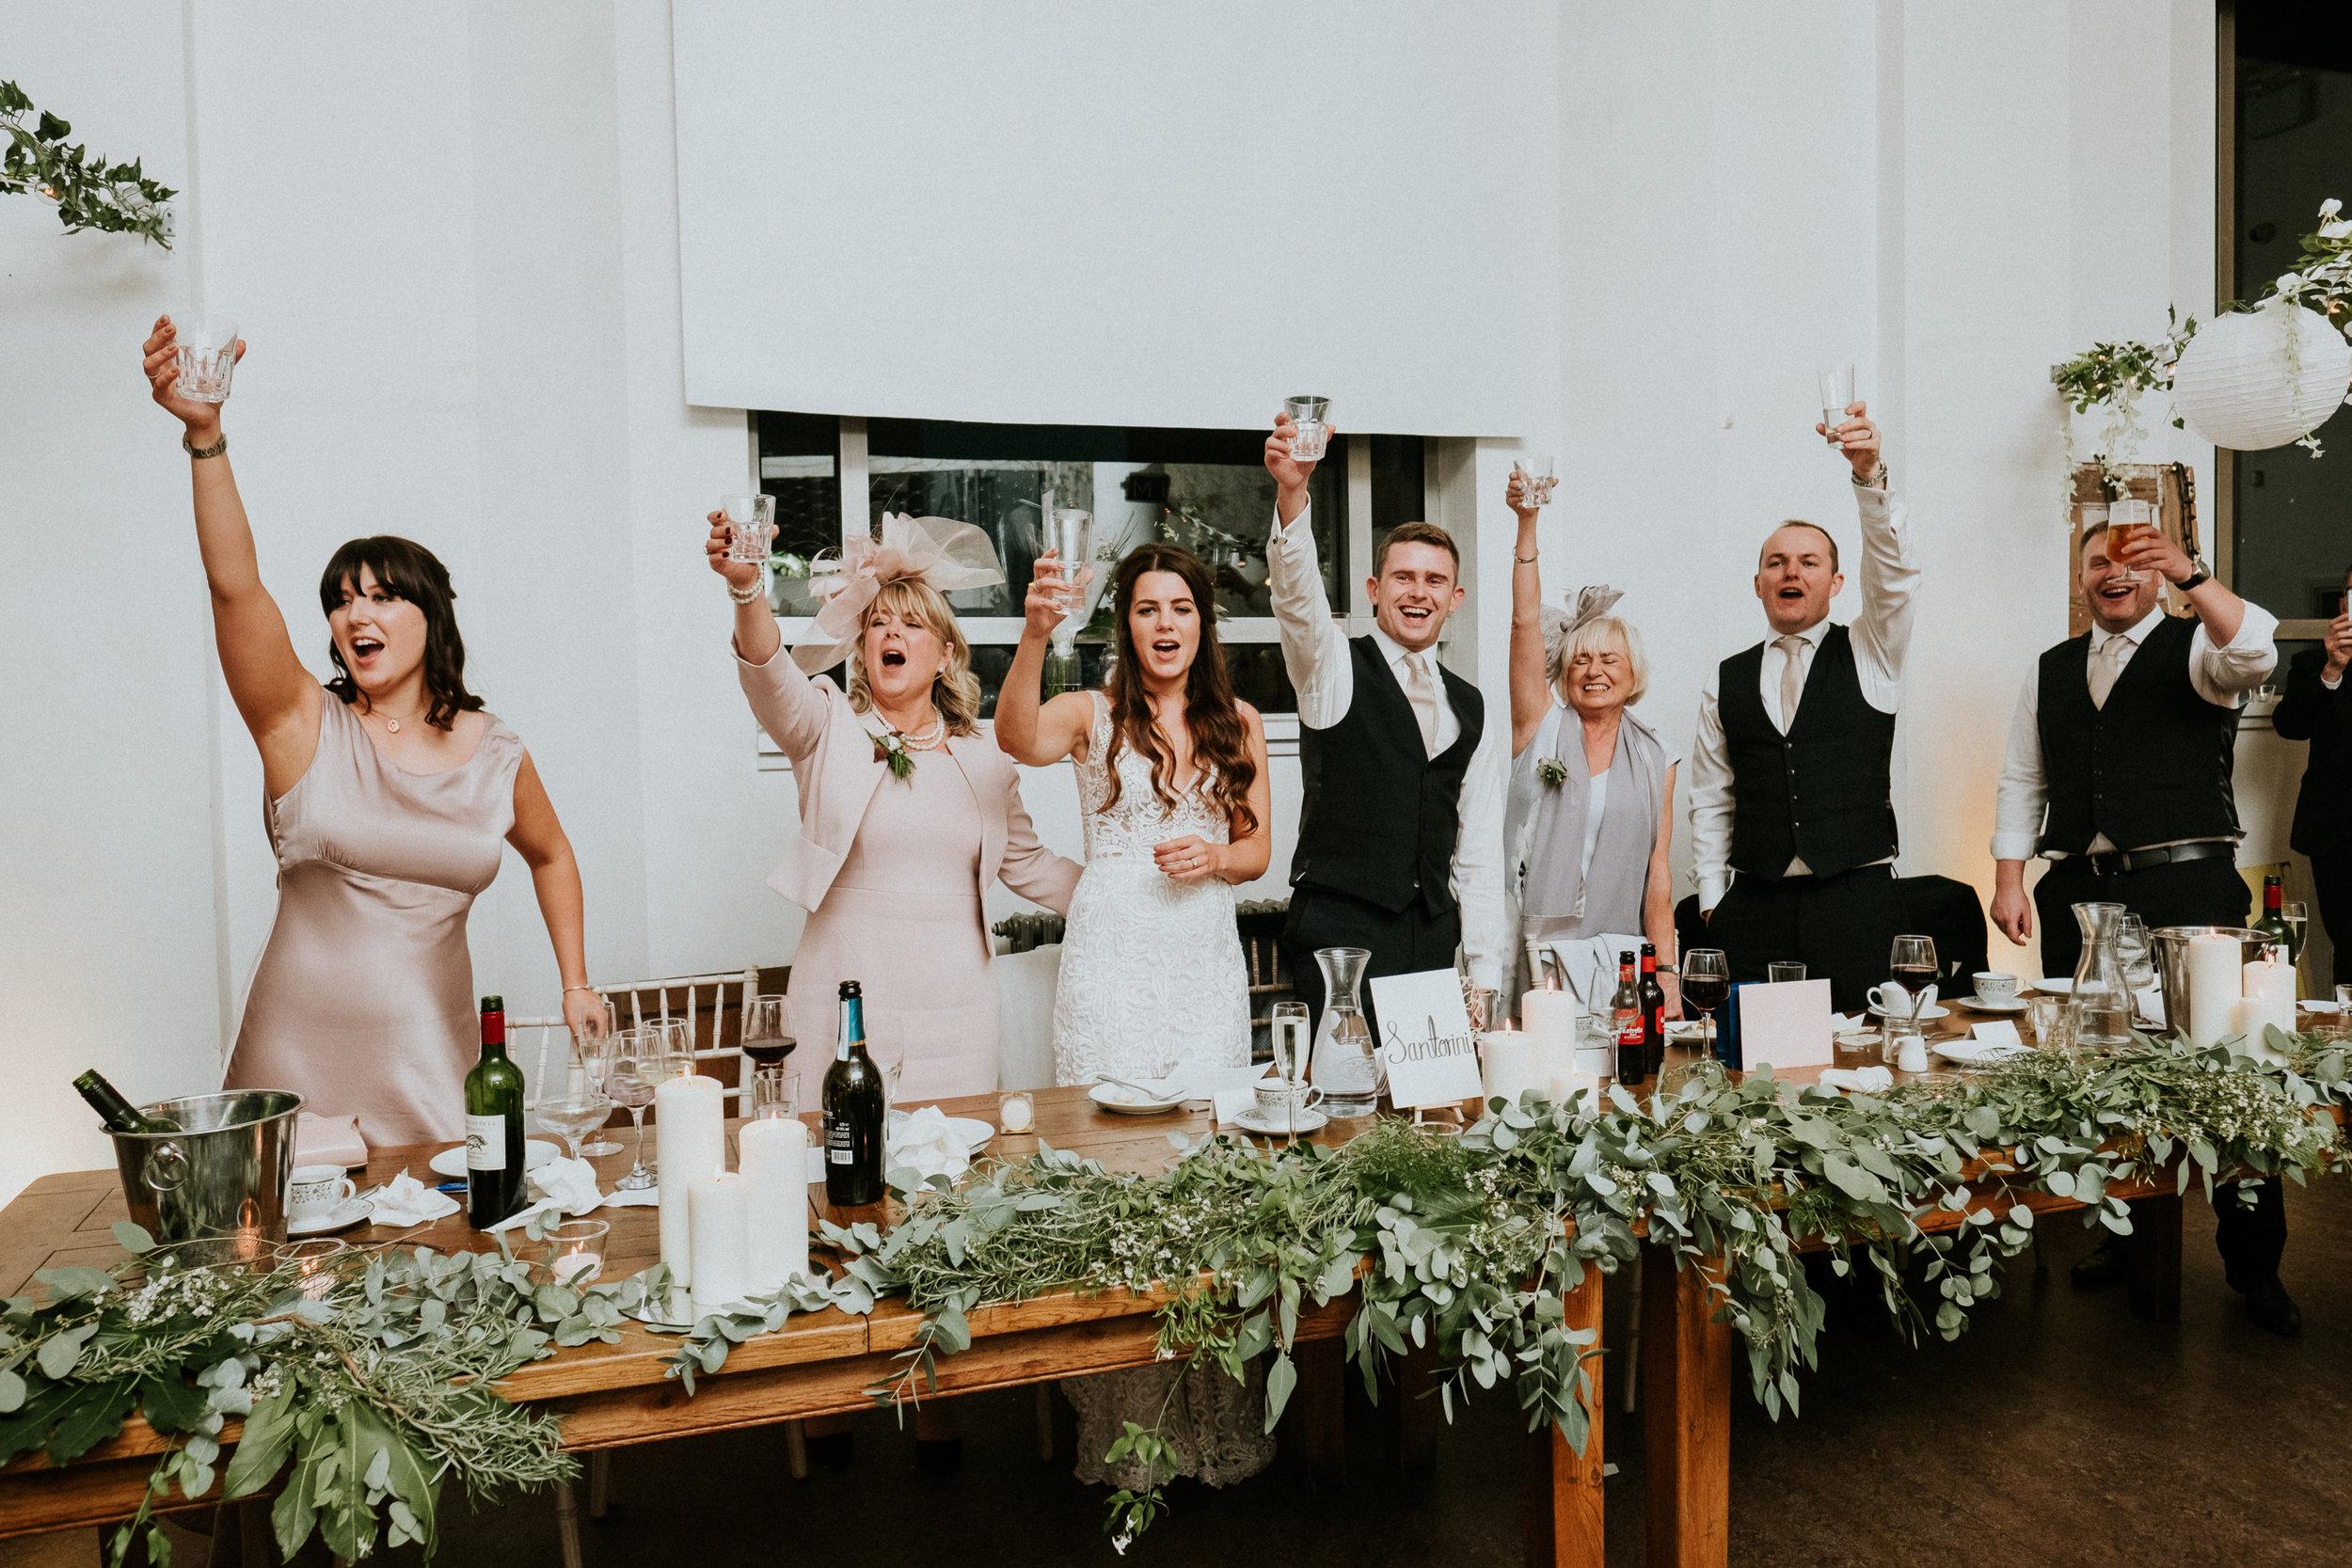 85 Oh Me Oh My Liverpool Cool Fun Creative Wedding Photographer Joanna Nicole Photography3.jpg